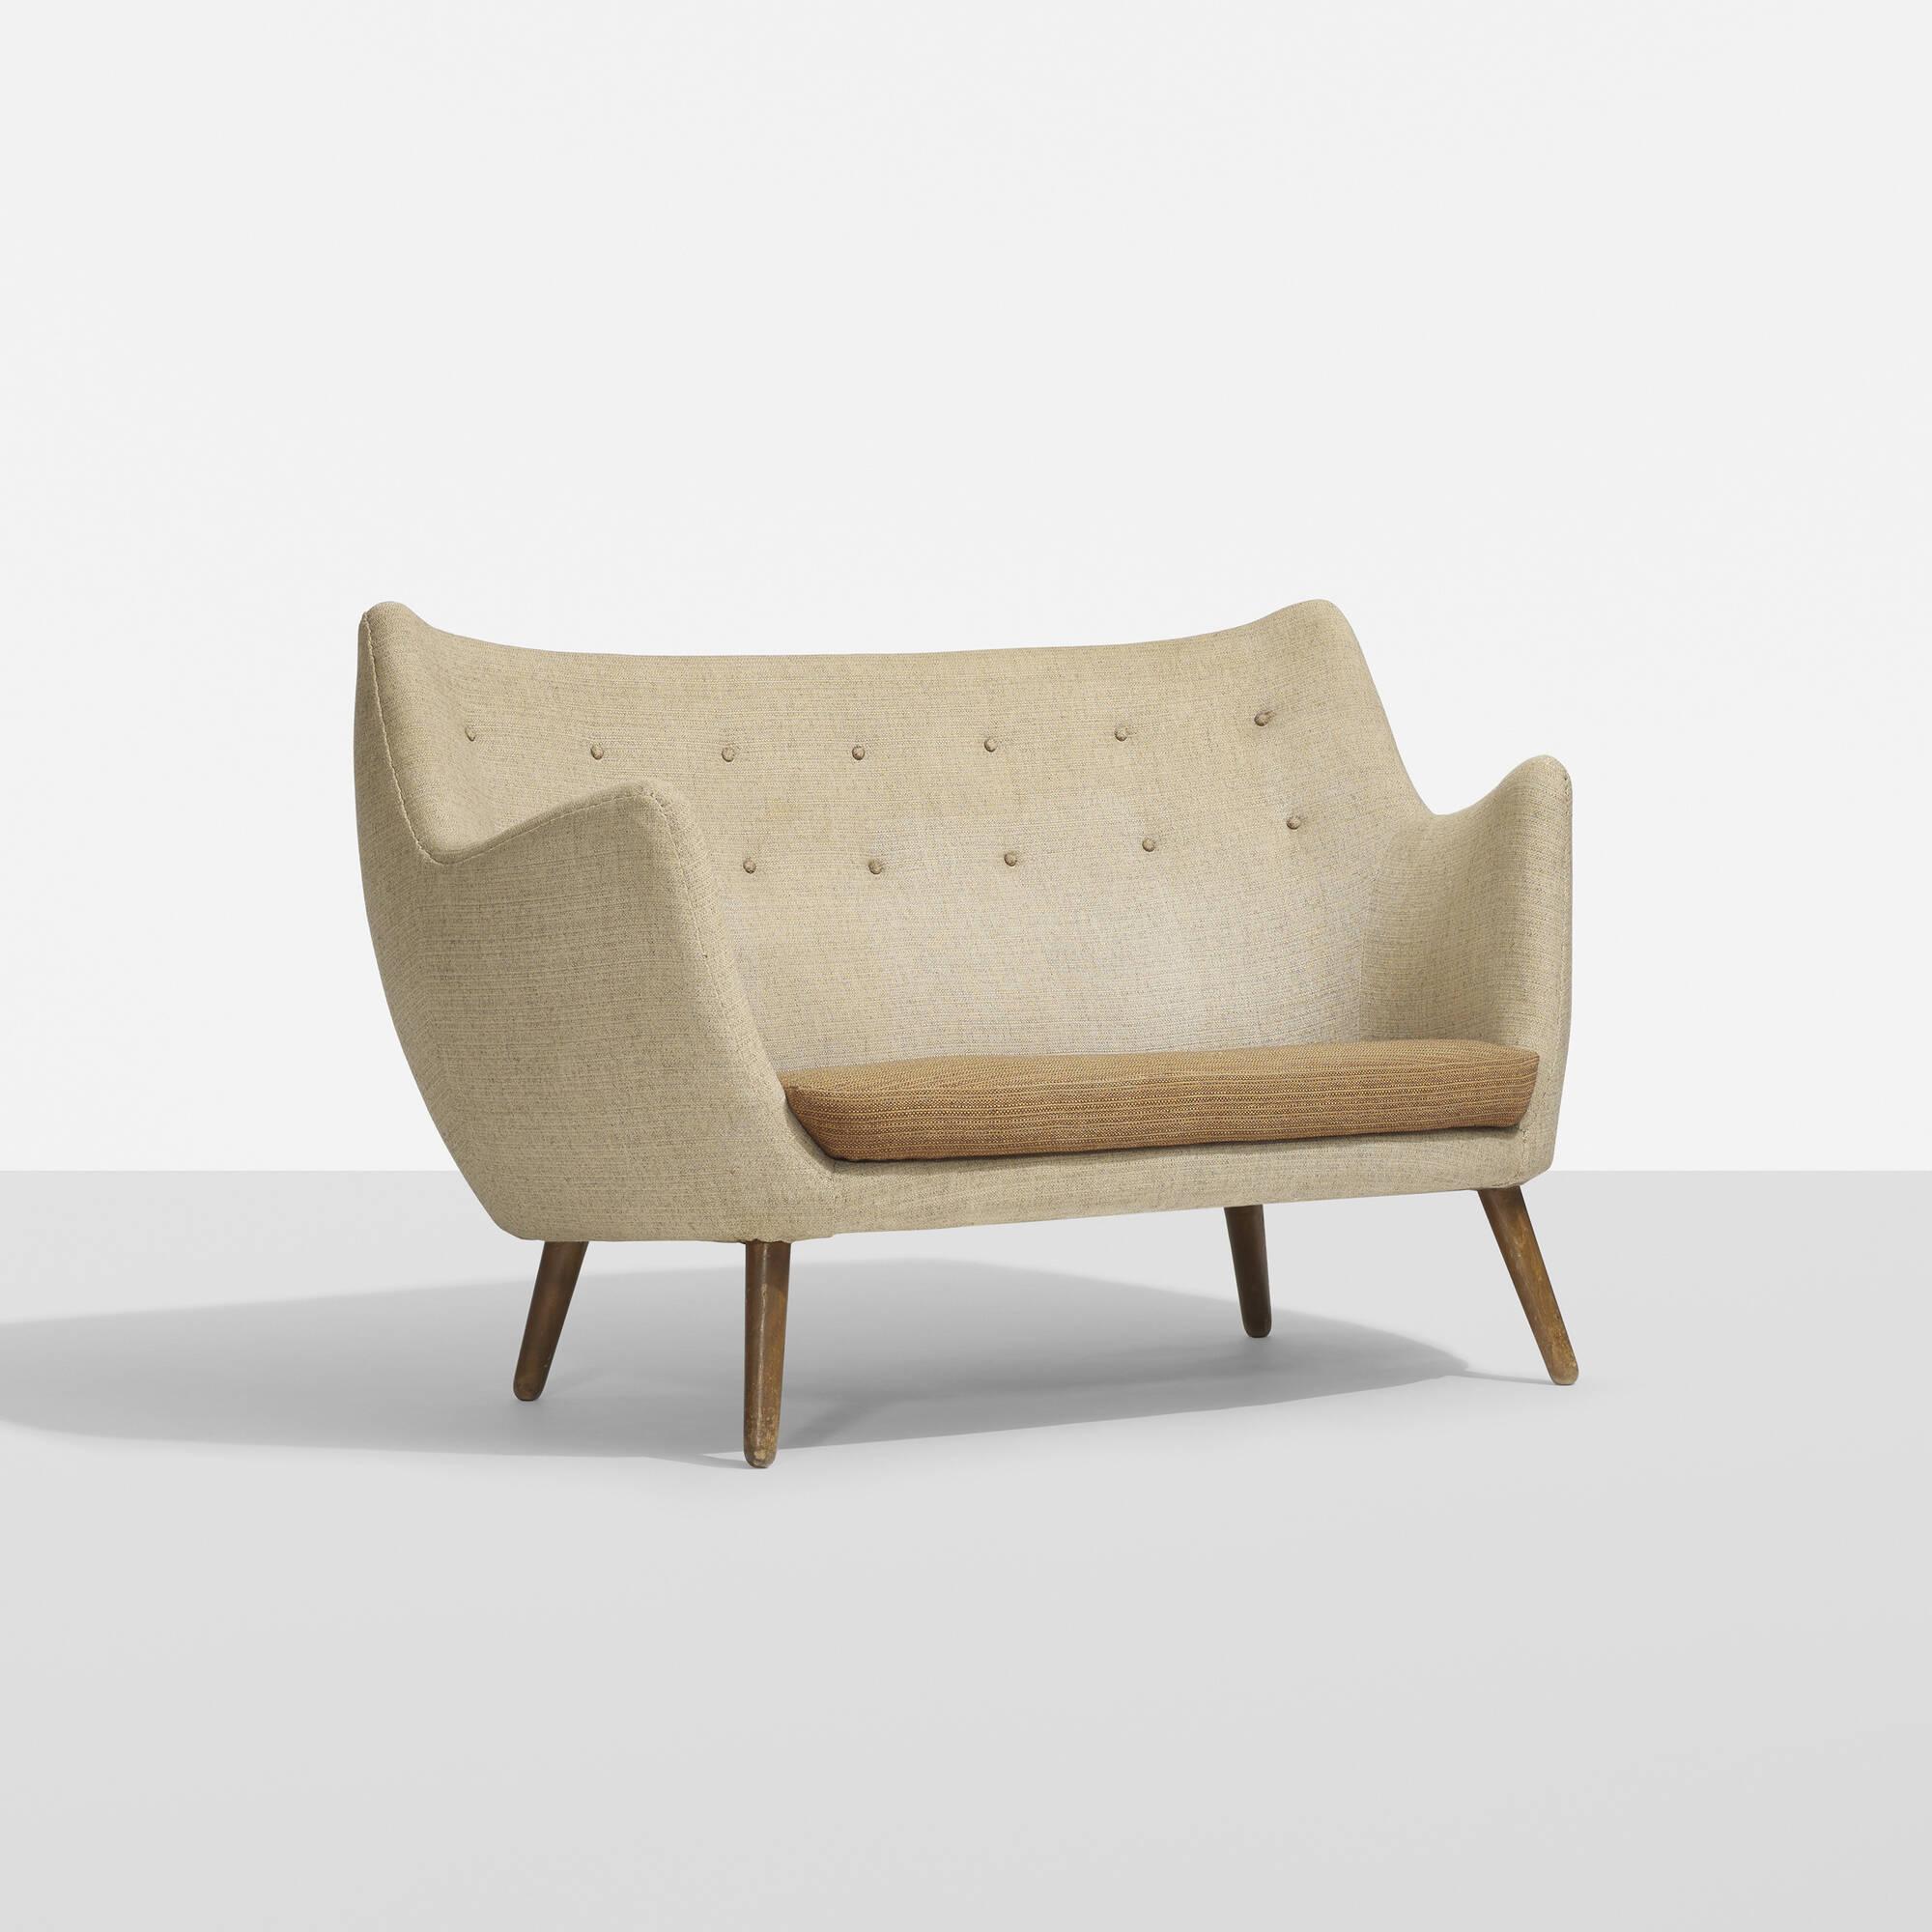 finn juhl poet sofa sale wooden furniture in chennai 112